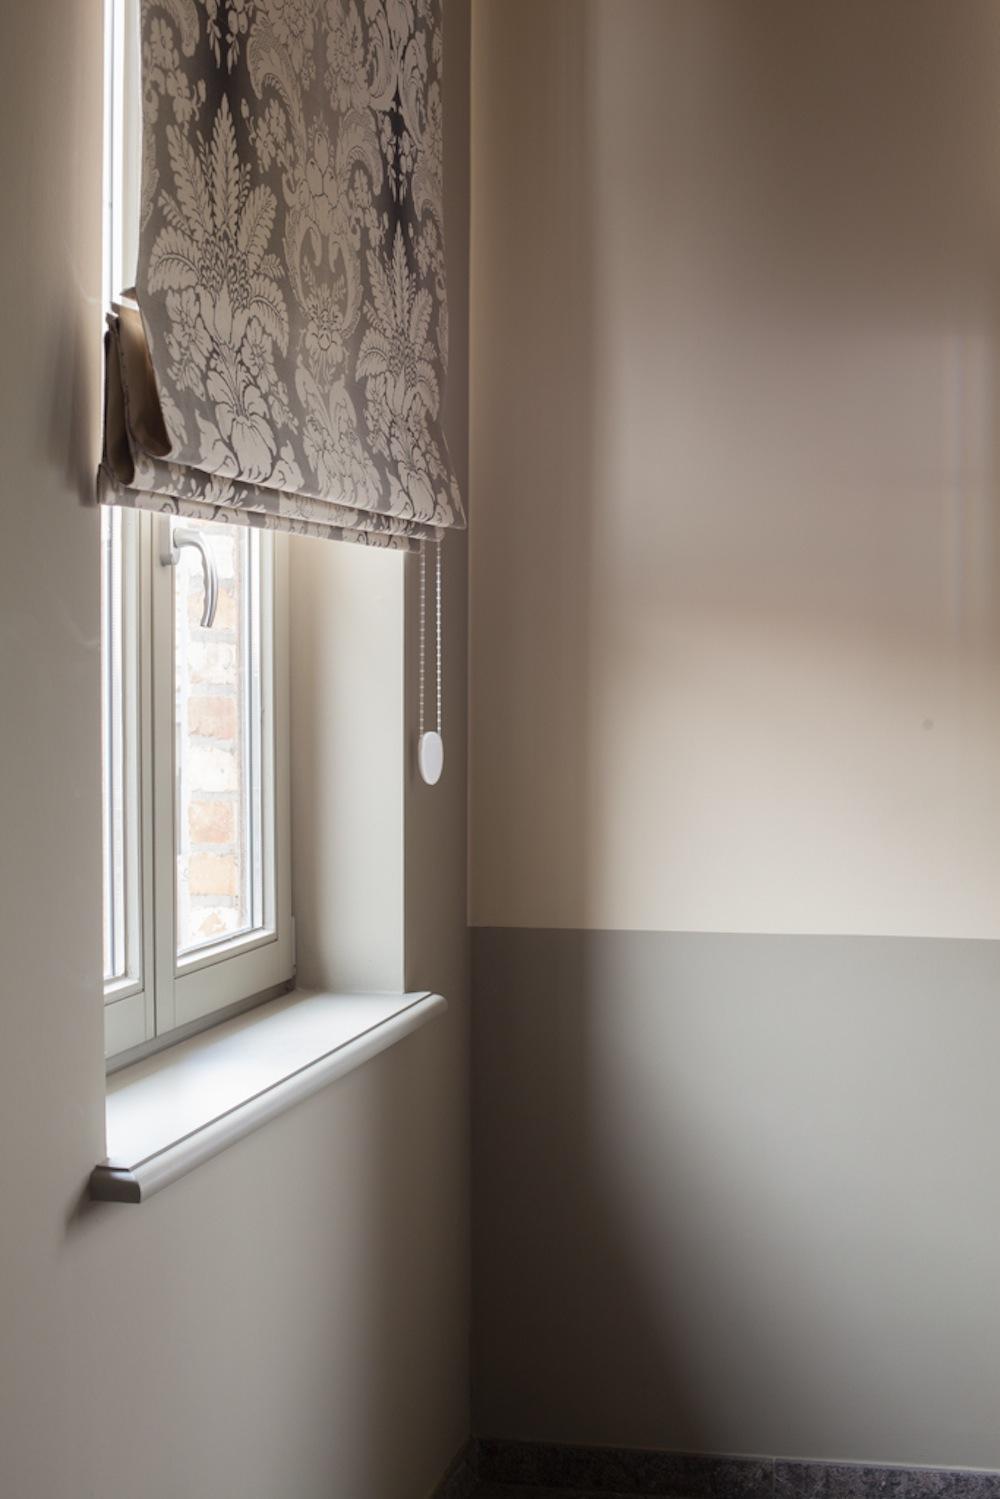 Awesome Silhouette Gordijnen Gallery - Huis & Interieur Ideeën ...